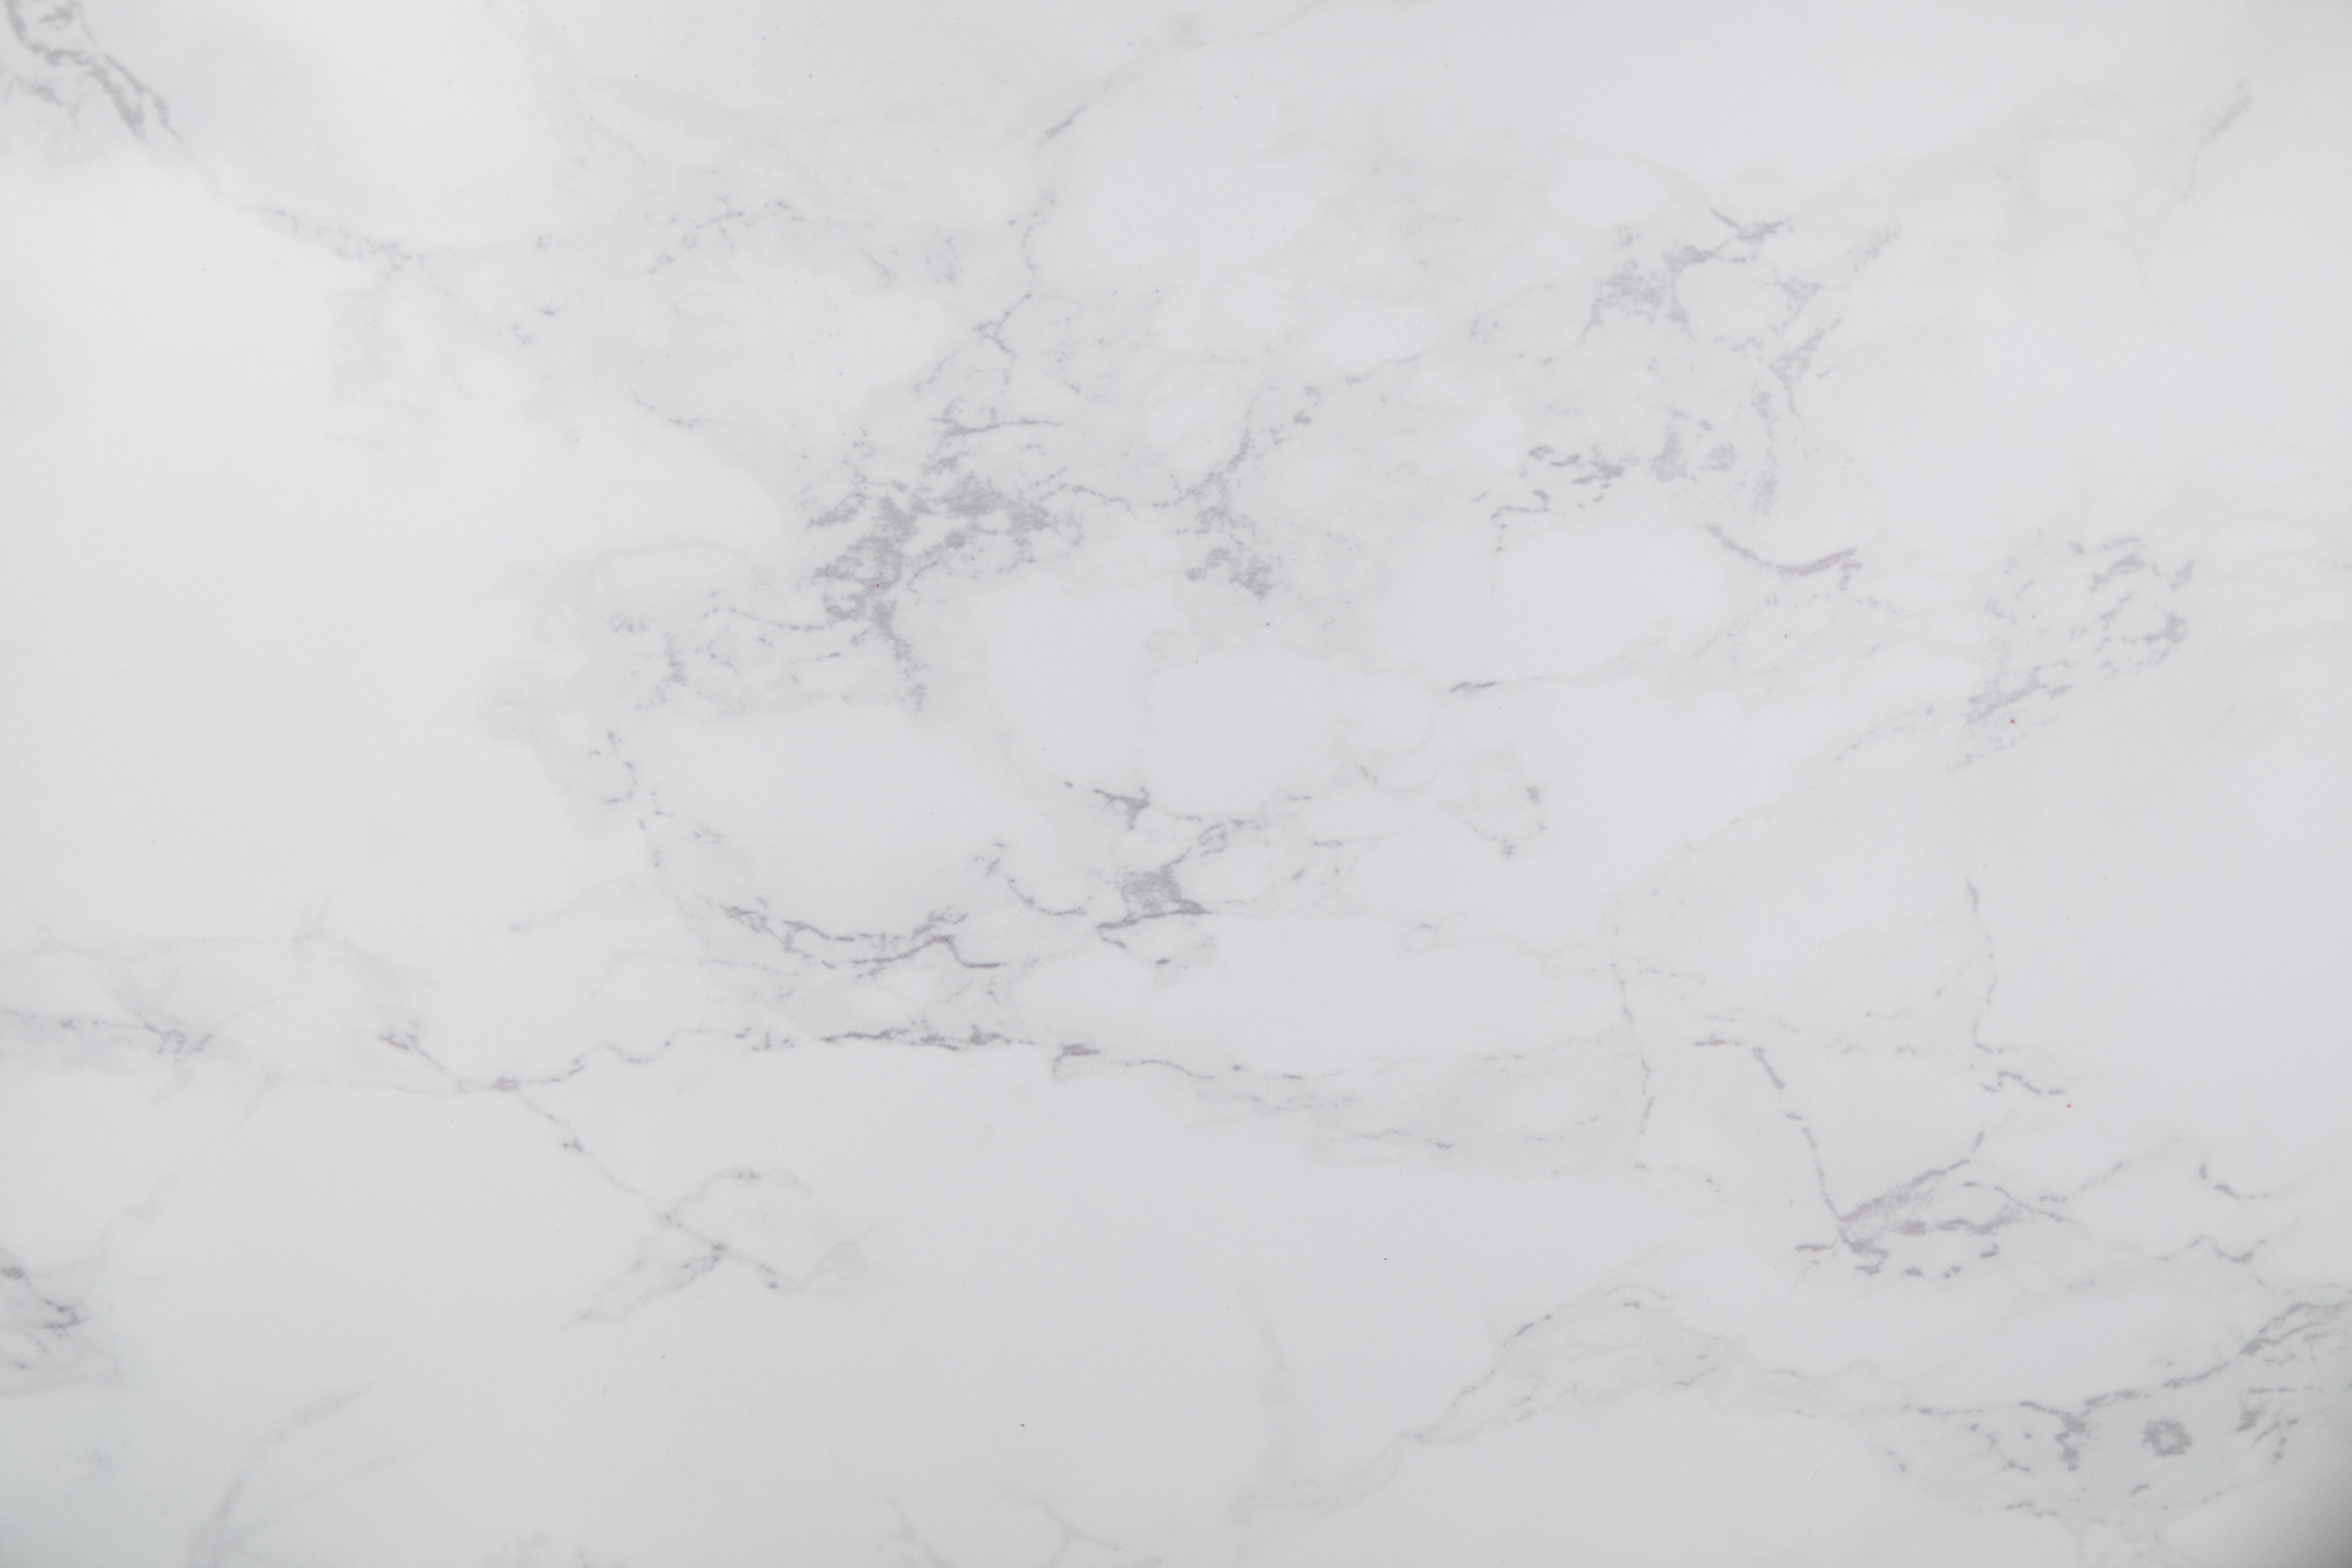 1000 Beautiful Marble Background Photos 183 Pexels 183 Free